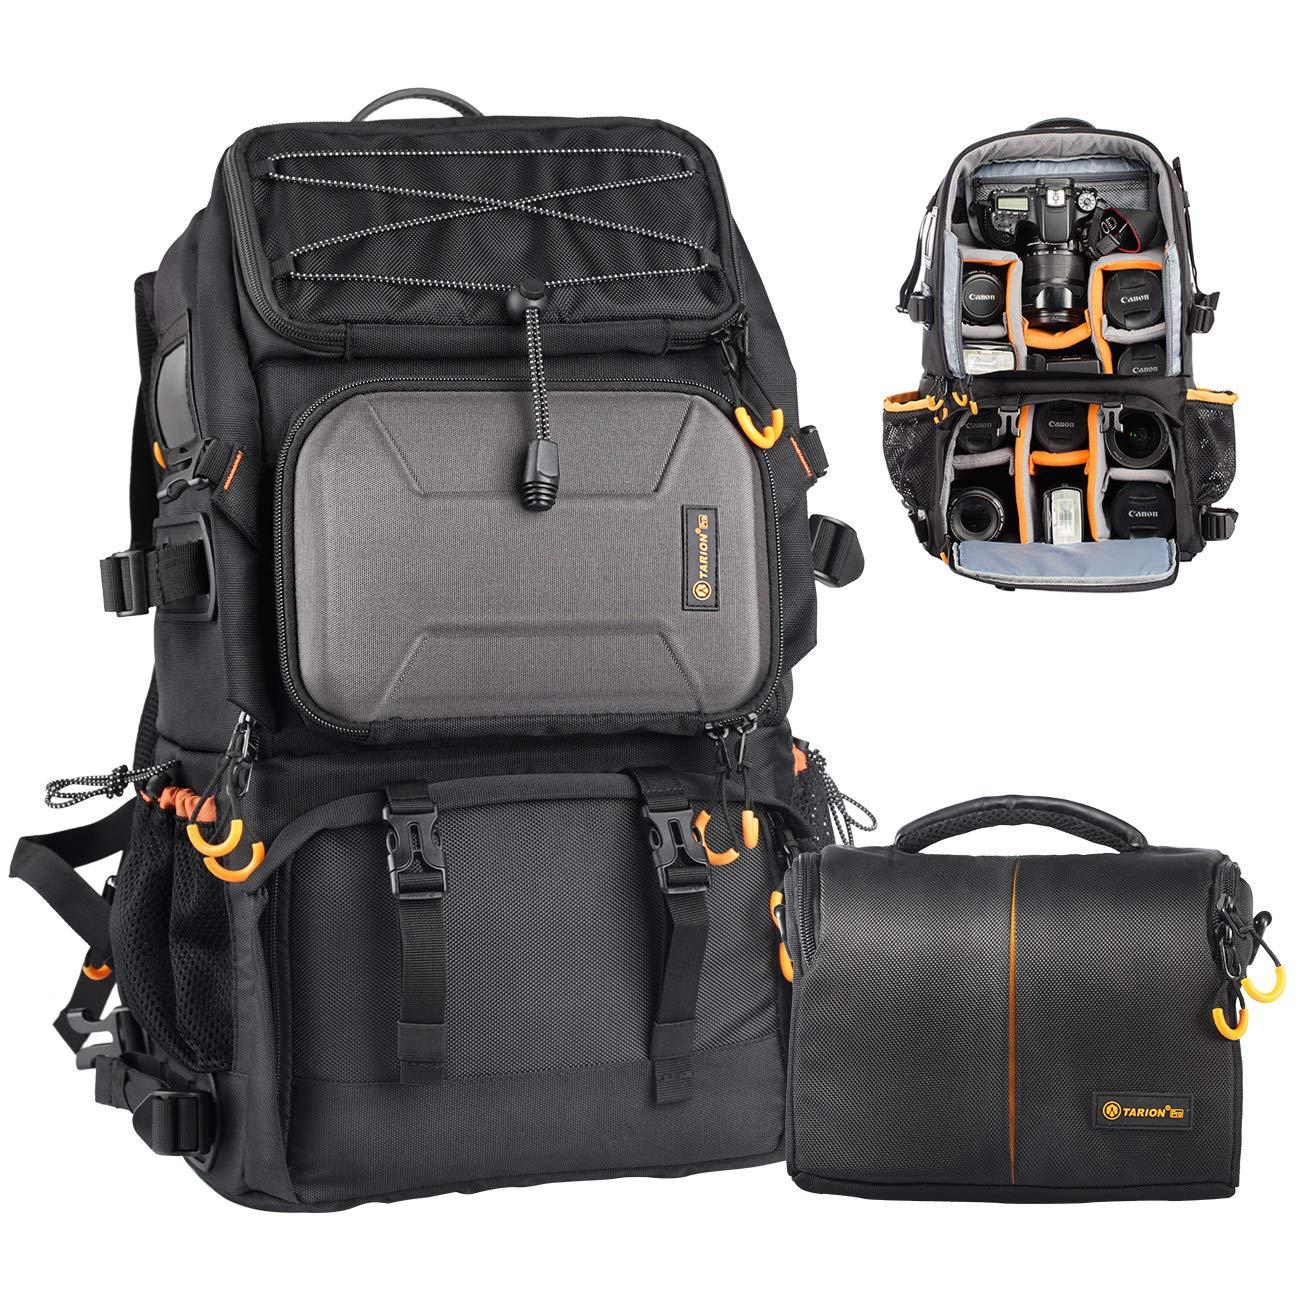 TARION Pro PB-01 Camera Bag Backpack with Shoulder Camera Case Bag 15.6'' Laptop Compartment Rain Cover Waterproof Large Camera Hiking Backpack DSLR Bag